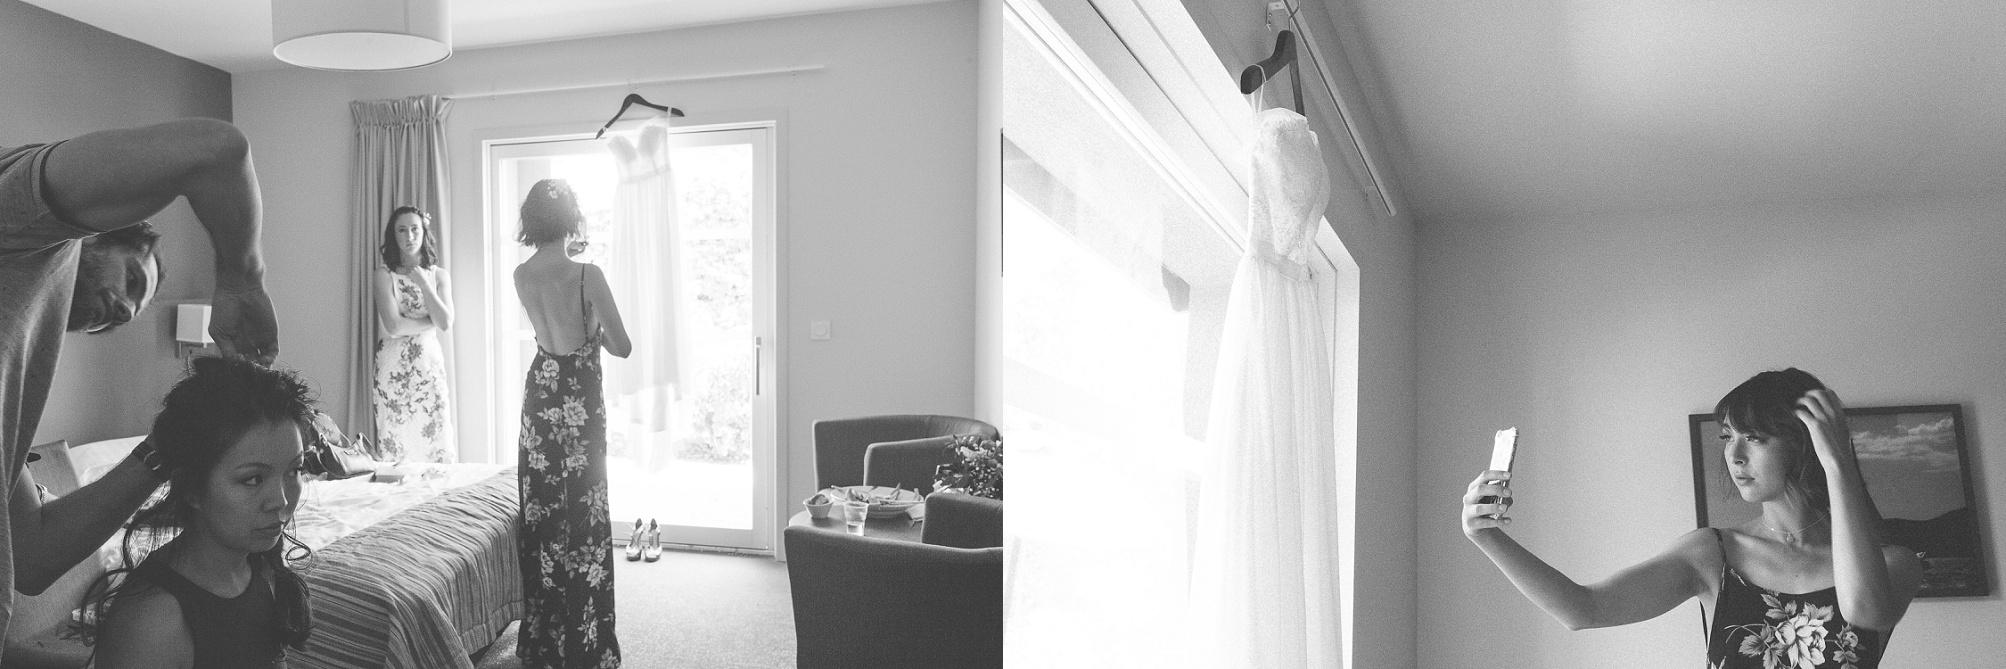 katerynaphotos-mariage-photographe-puyloubier-provence-aix-en-provence-sud-de-la-france_0337.jpg